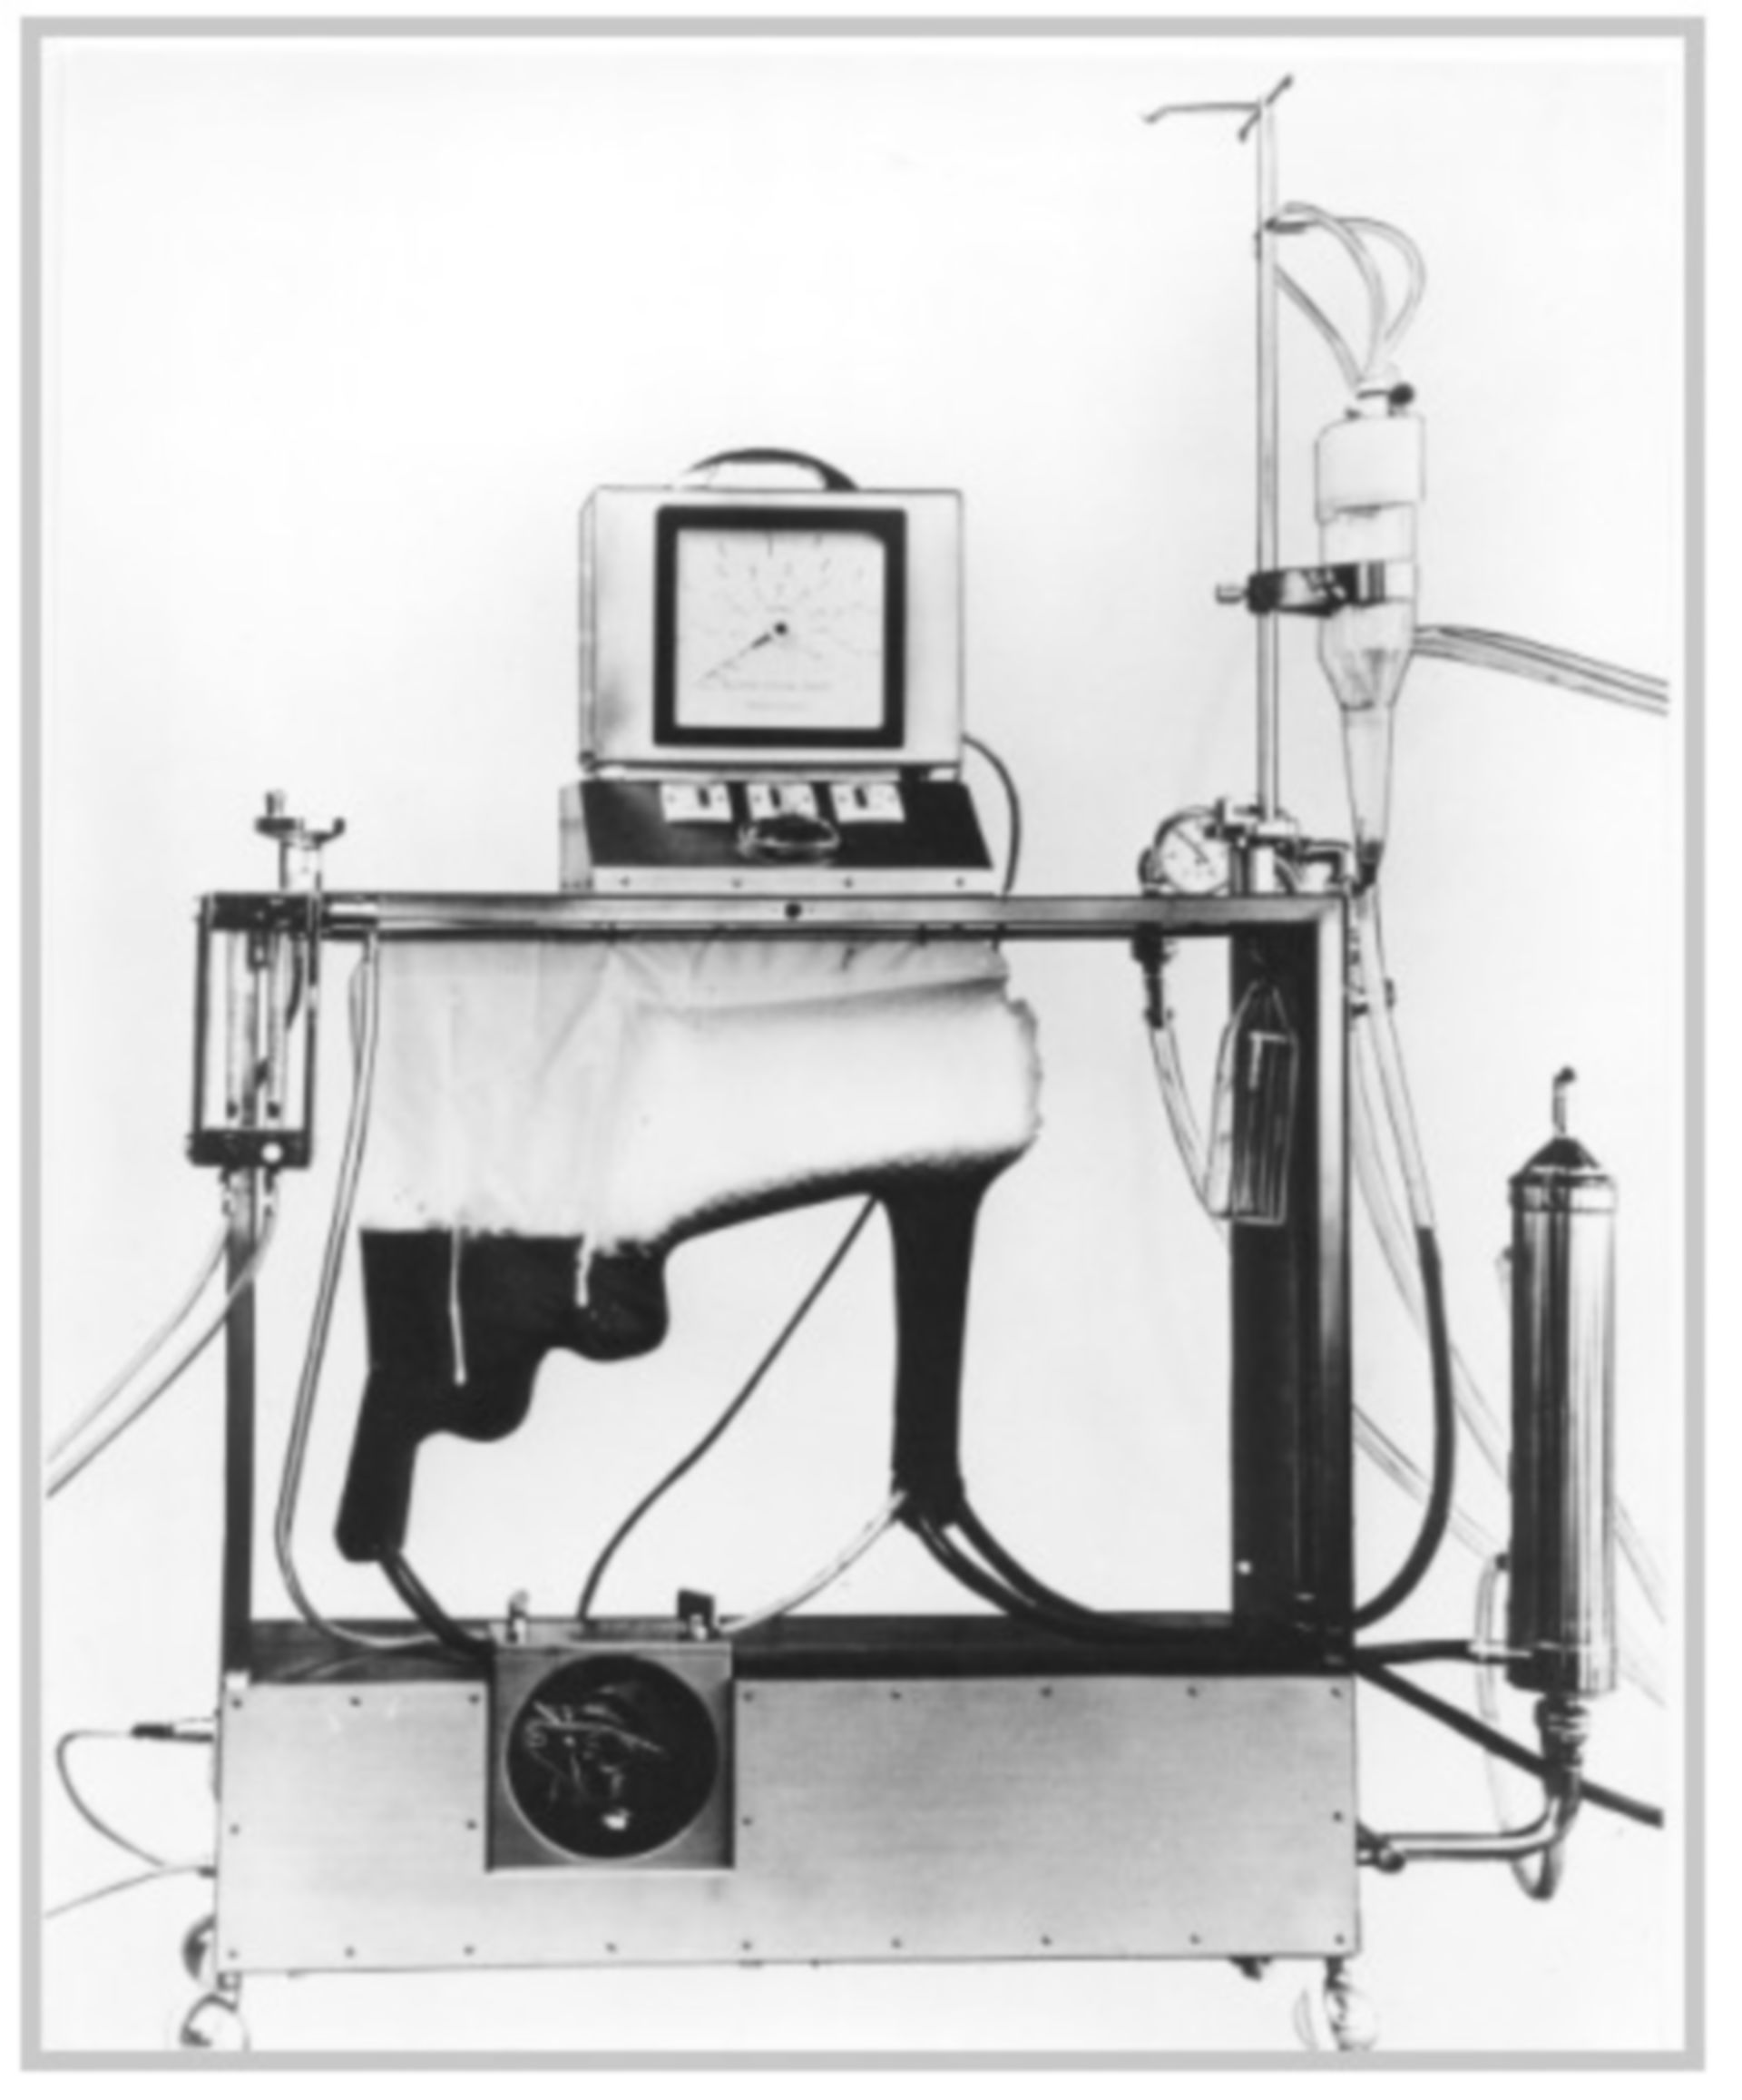 CPB - Heart Lung Machine (1970)